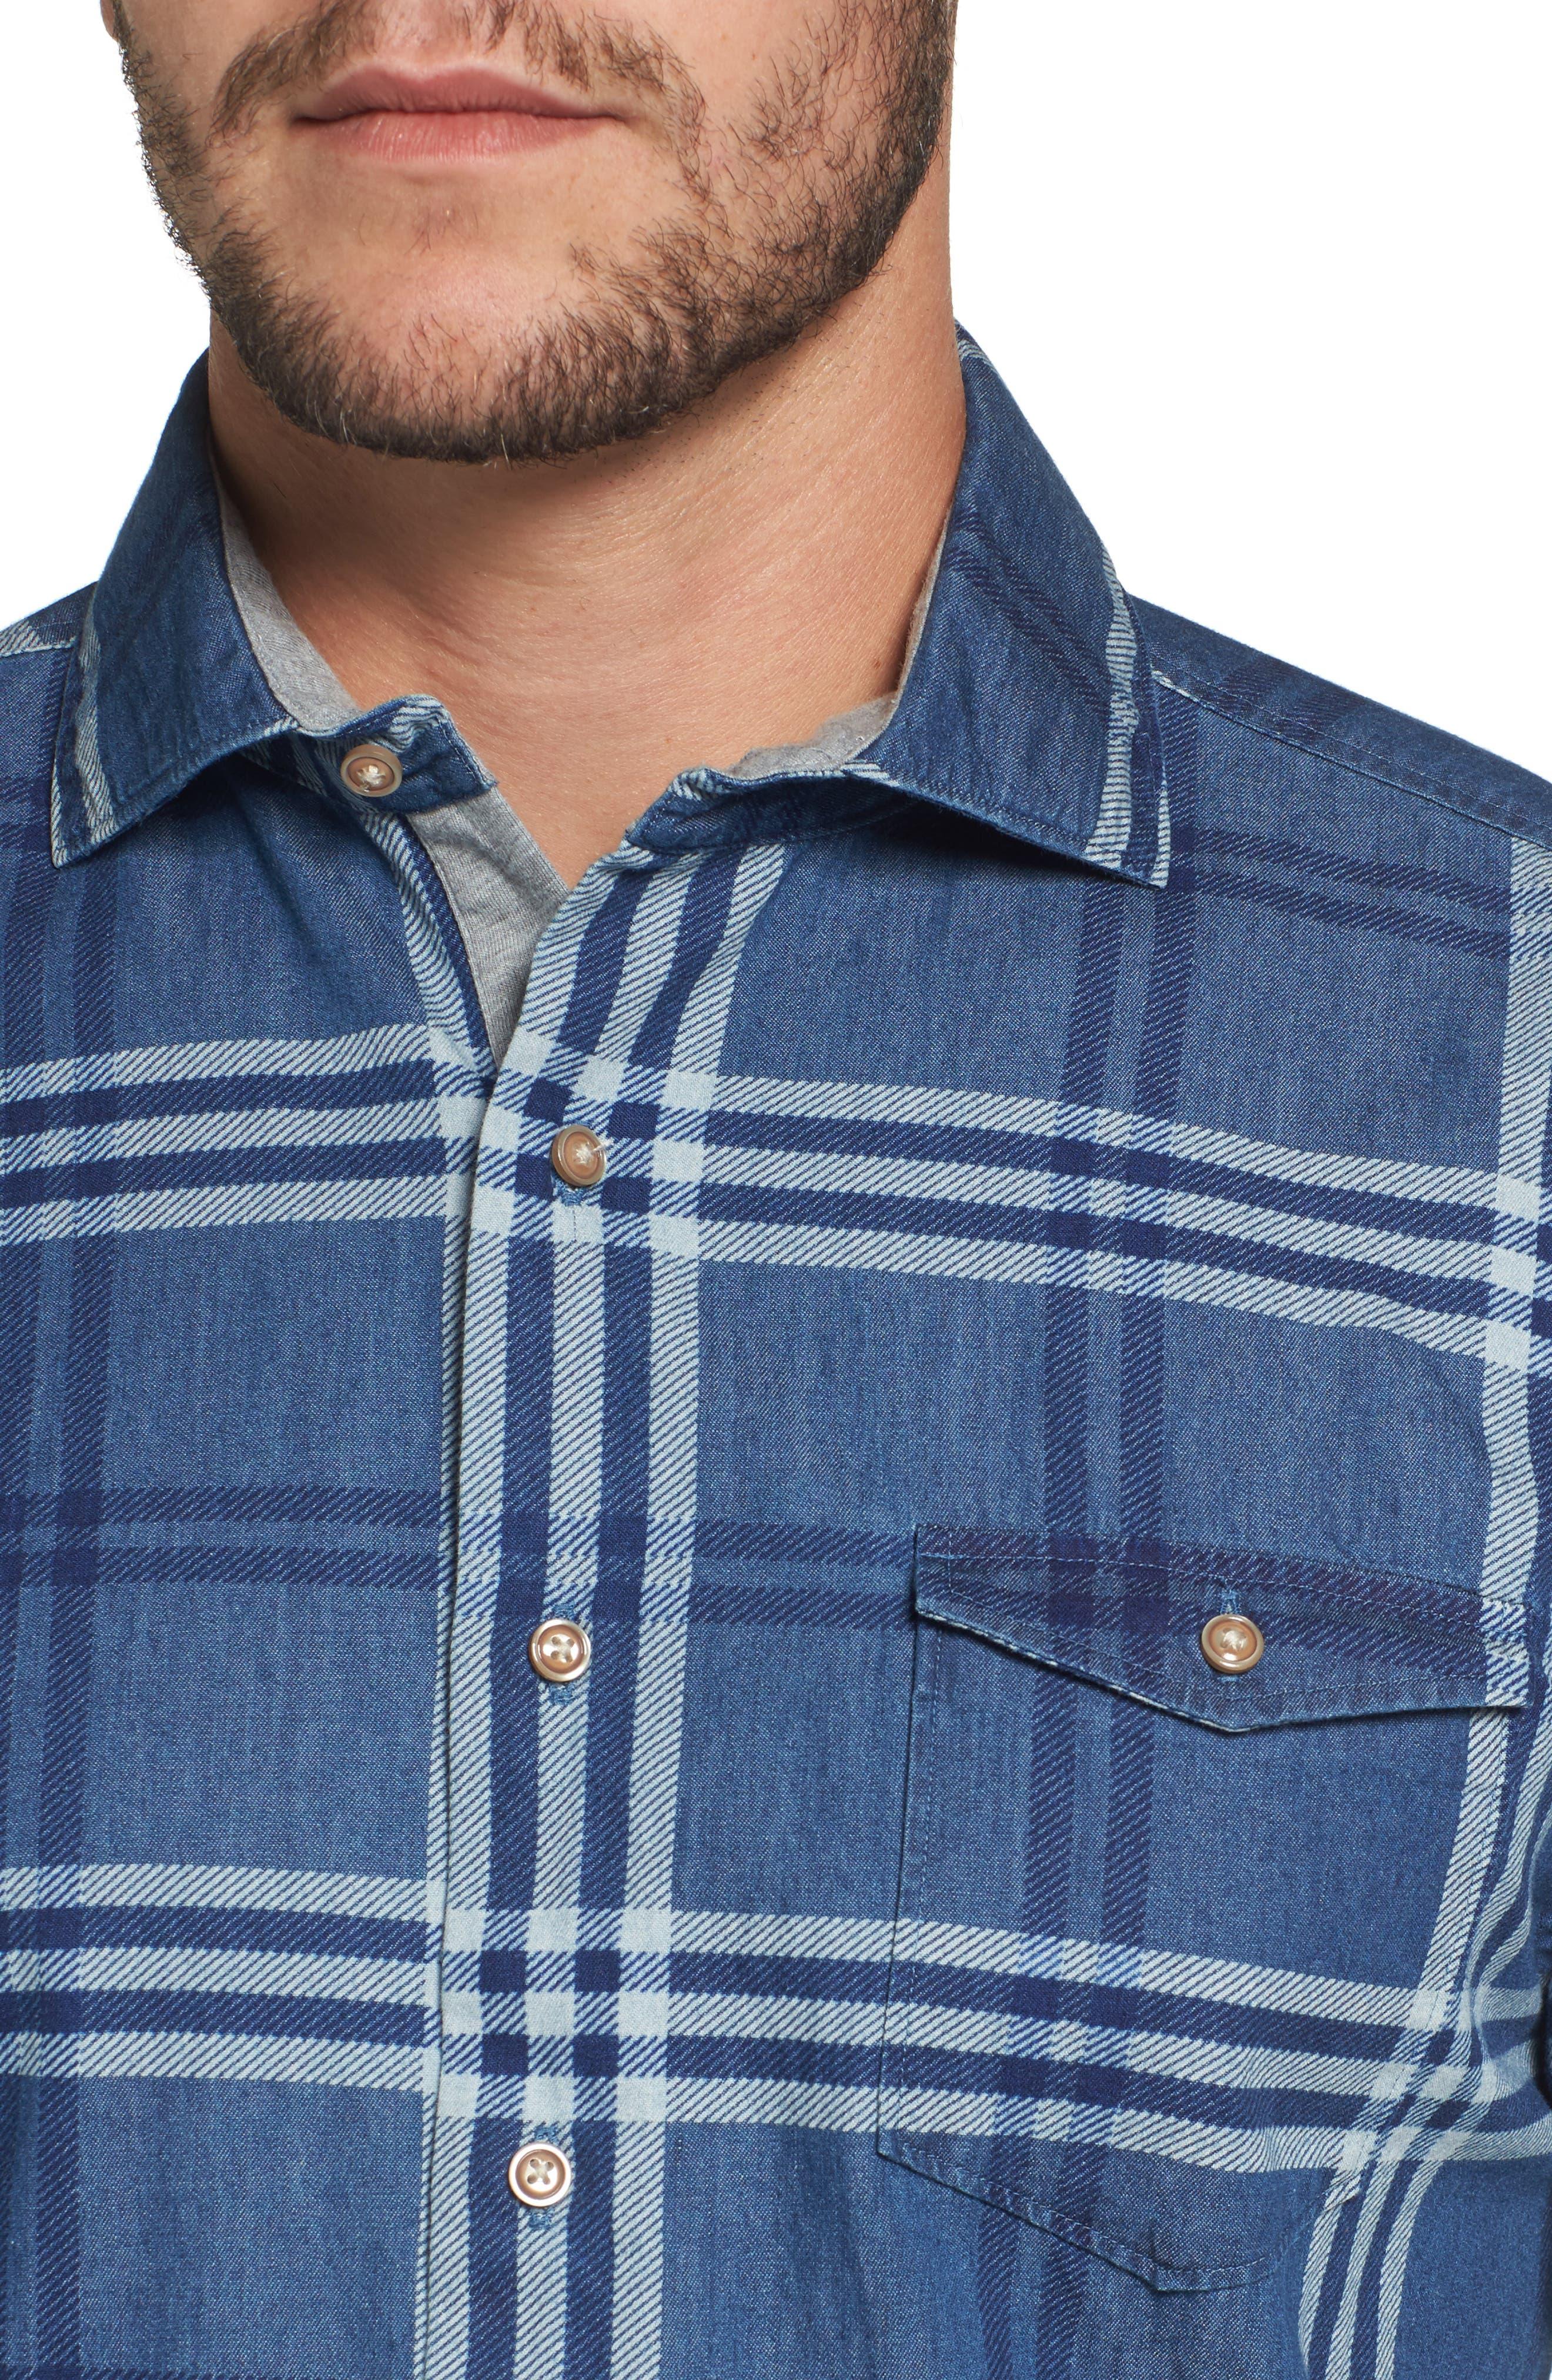 Breckenridge Plaid Sport Shirt,                             Alternate thumbnail 4, color,                             400